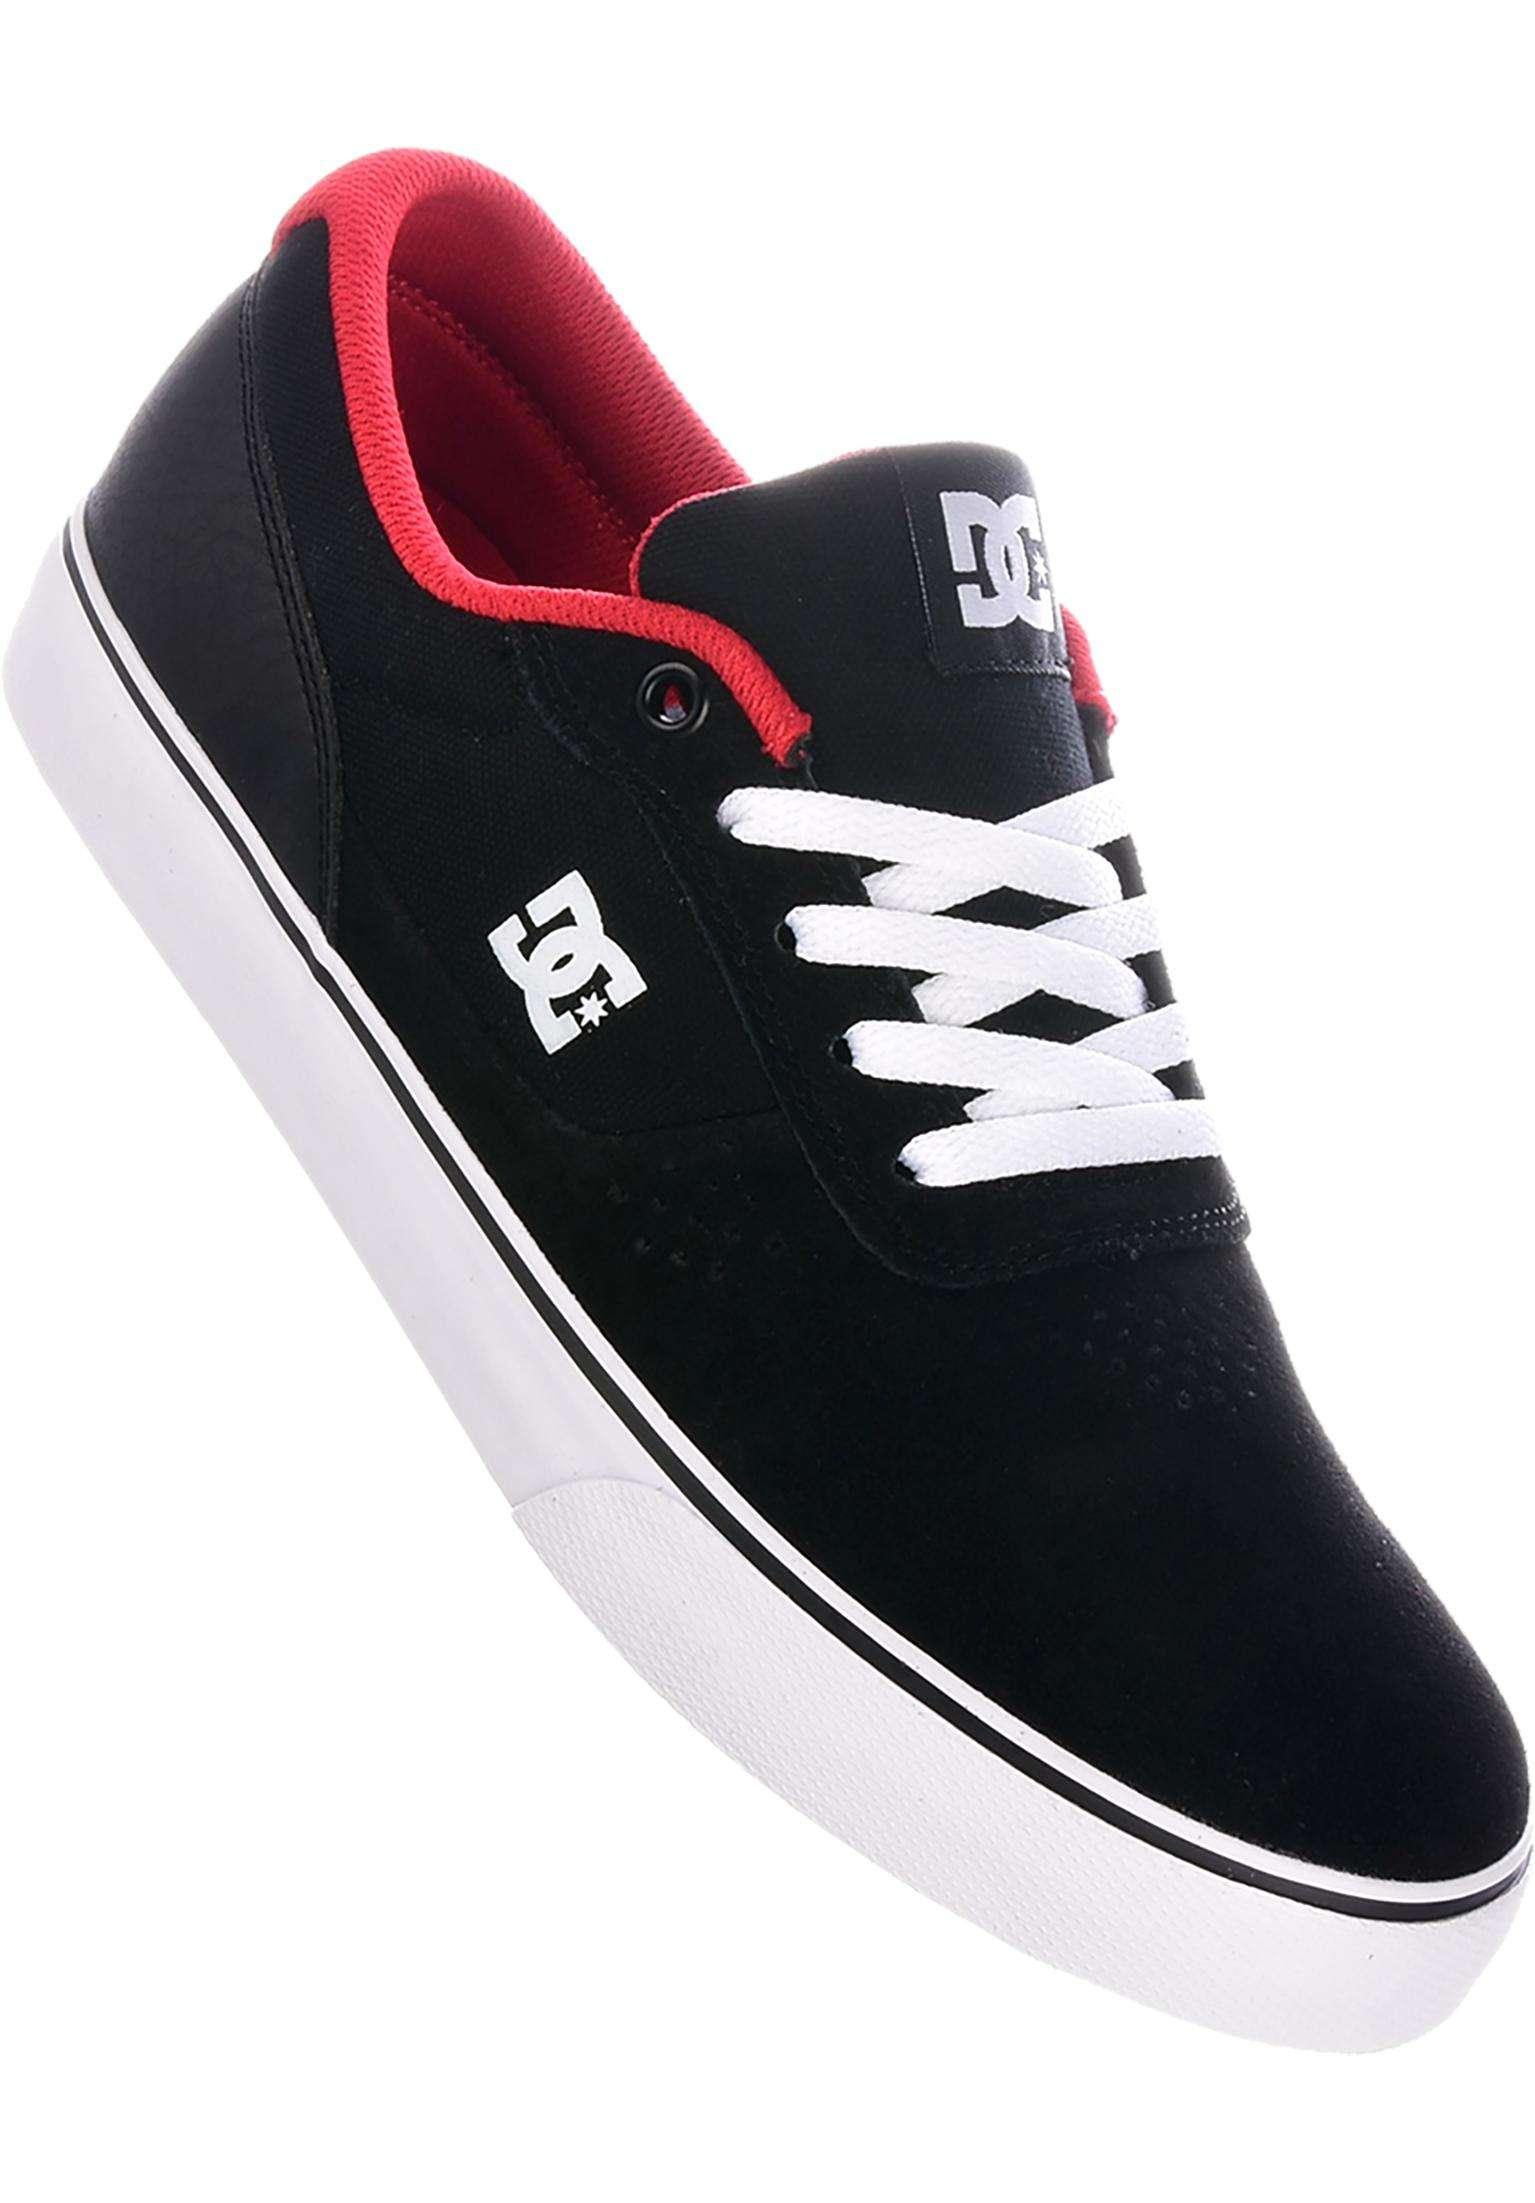 10693af7a9 Switch S DC Shoes Alle Schuhe in black-athleticred für Herren | Titus